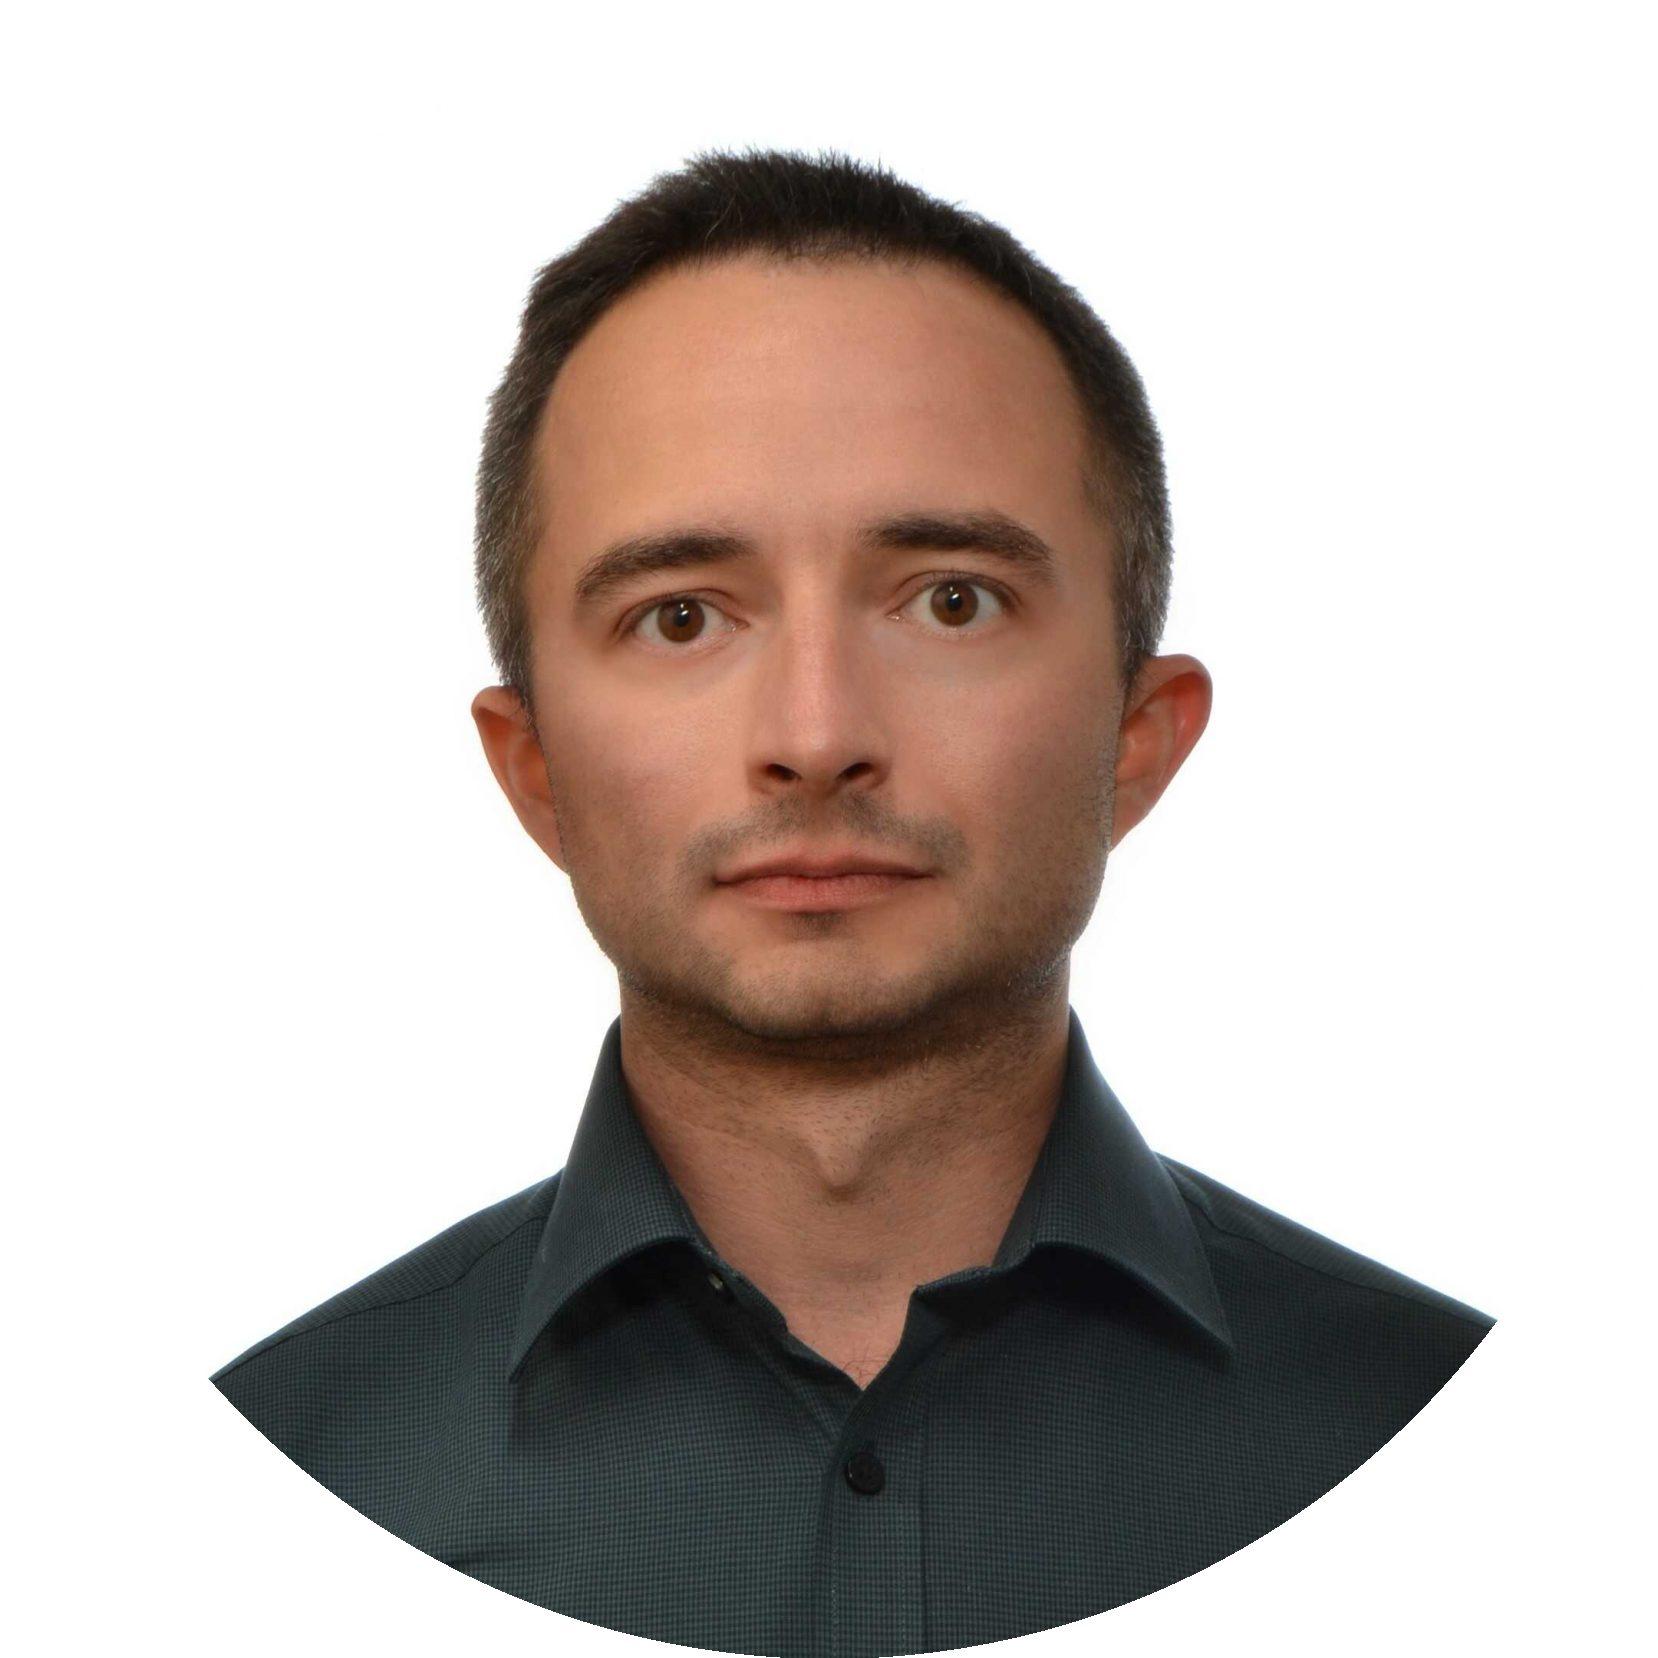 Łukasz Pałka